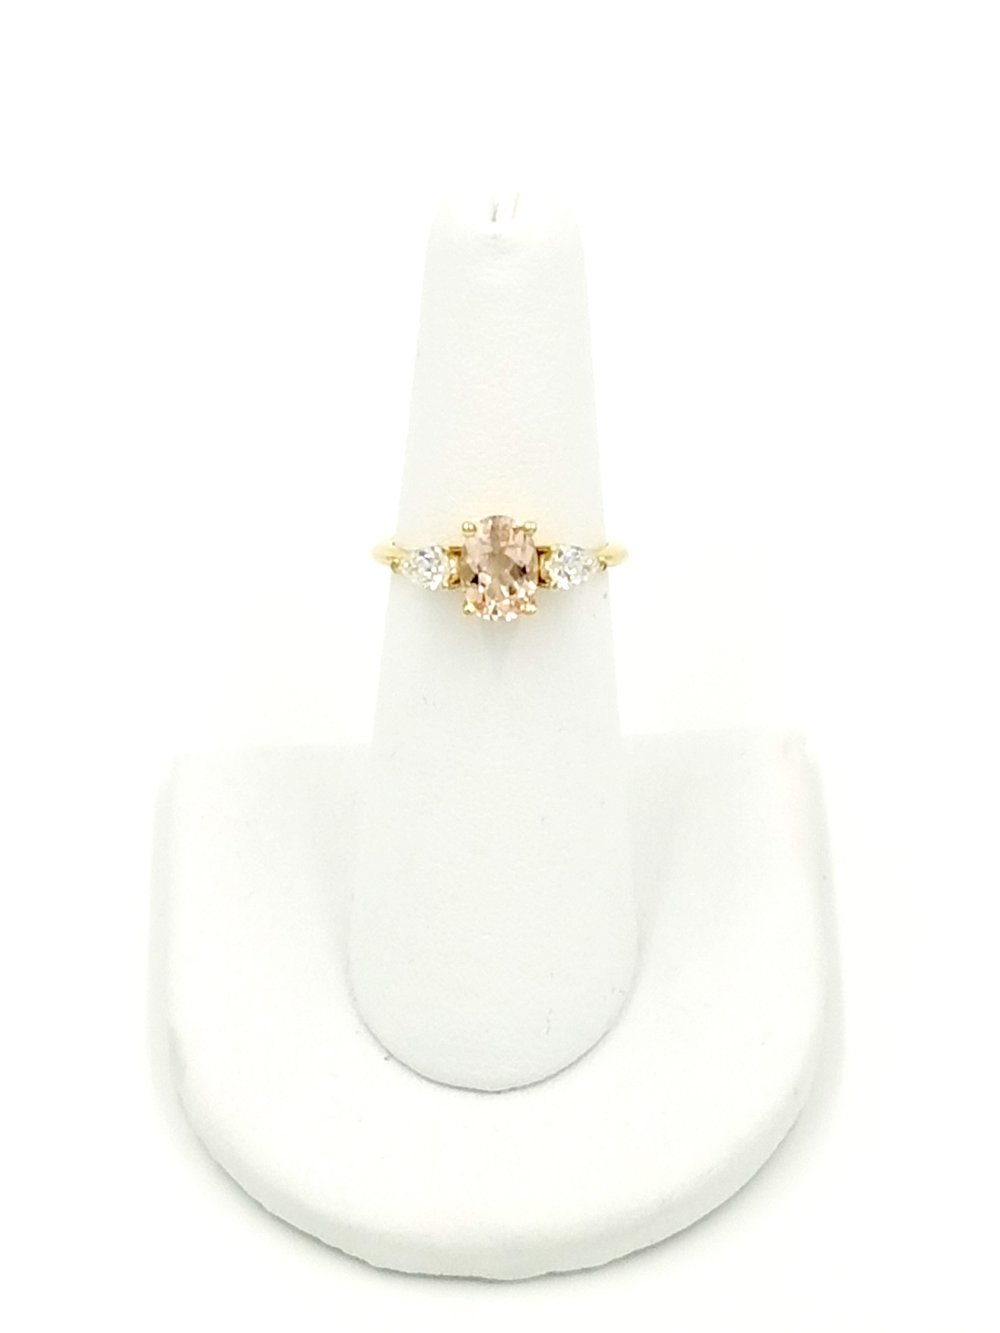 Katie's Ring.jpg